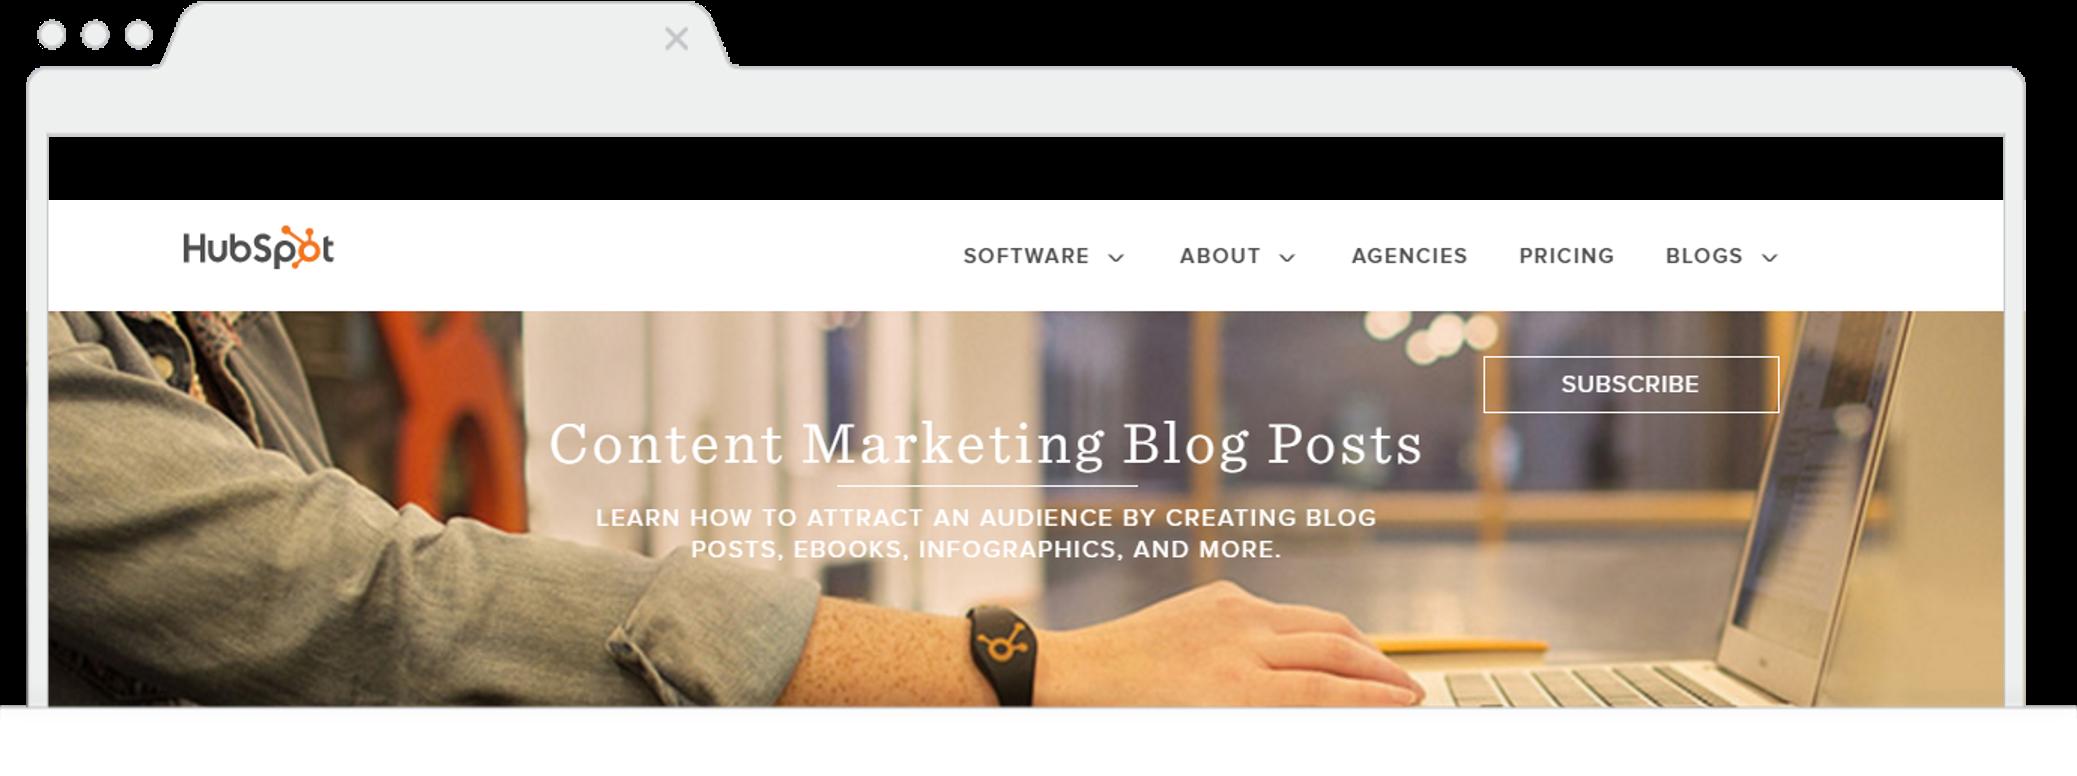 Must Read Content Marketing Blogs 2017 HubSpot Content Marketing